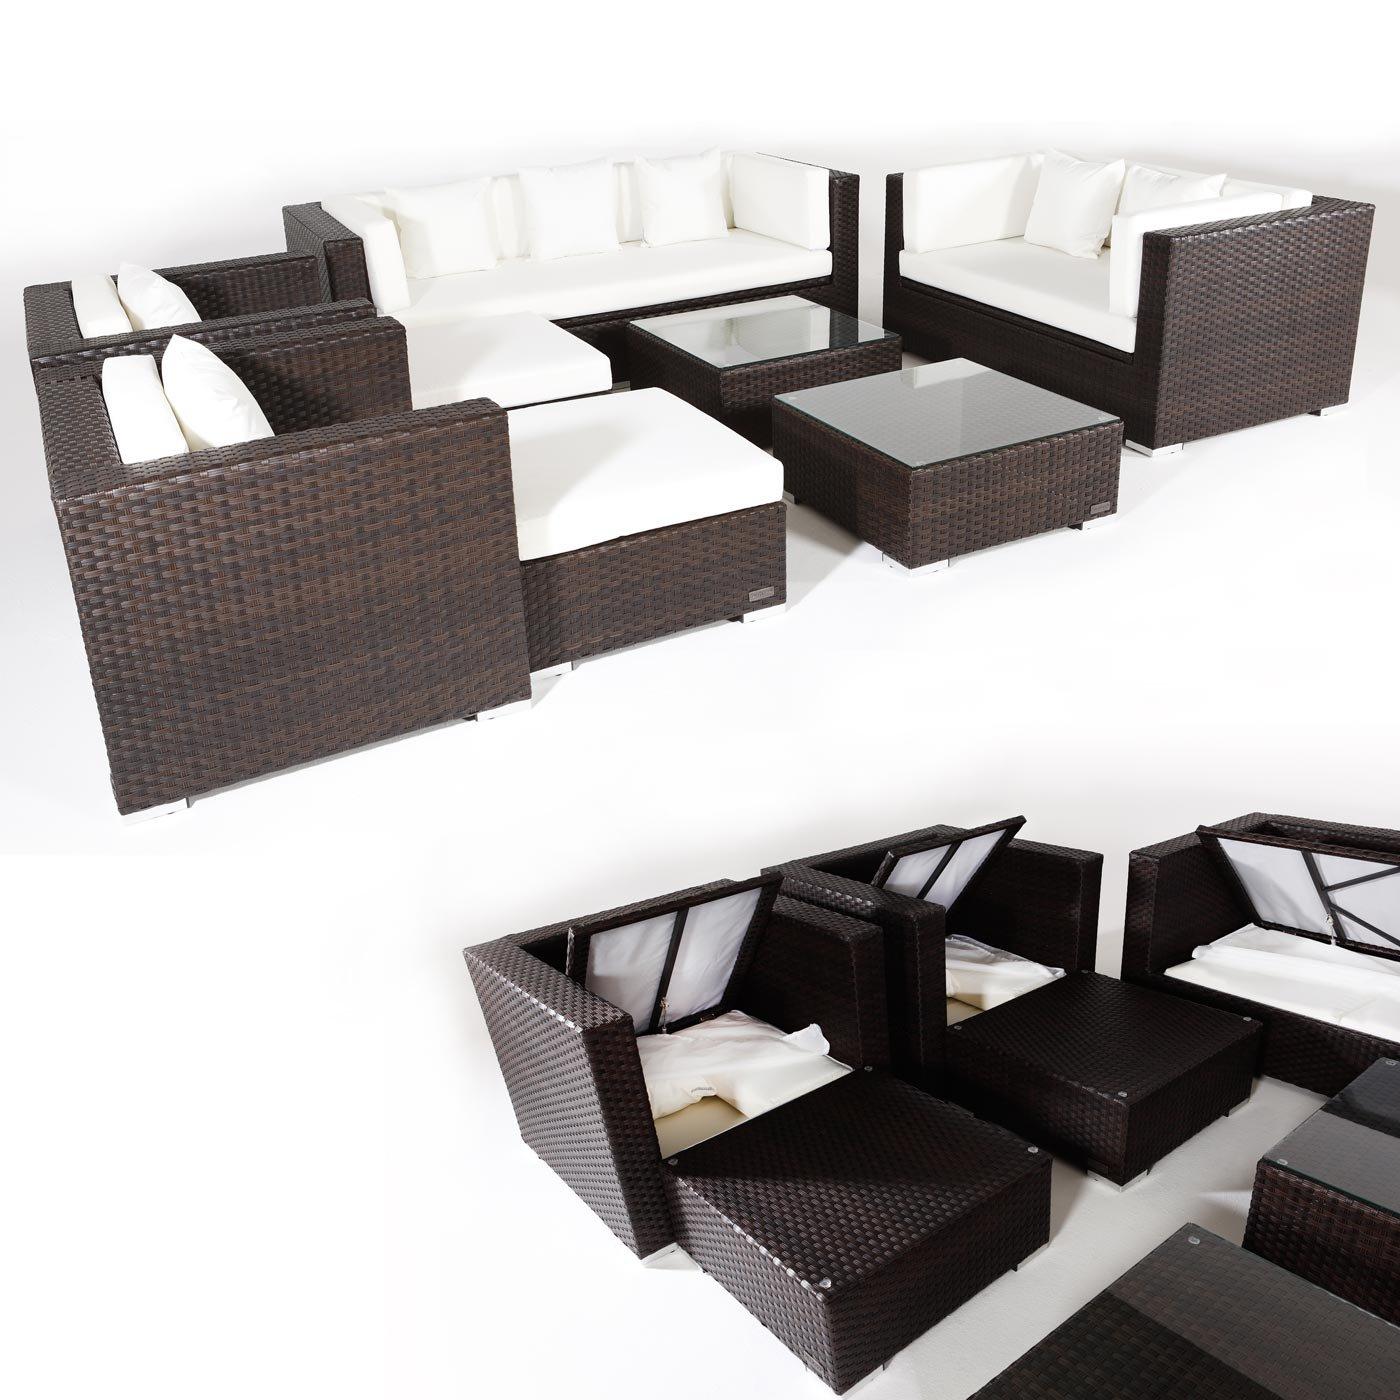 Poly-Rattan Sofa-Garnitur AH006, Lounge-Set Gartengarnitur Sitzgruppe, Kissenboxfunktion ~ braun